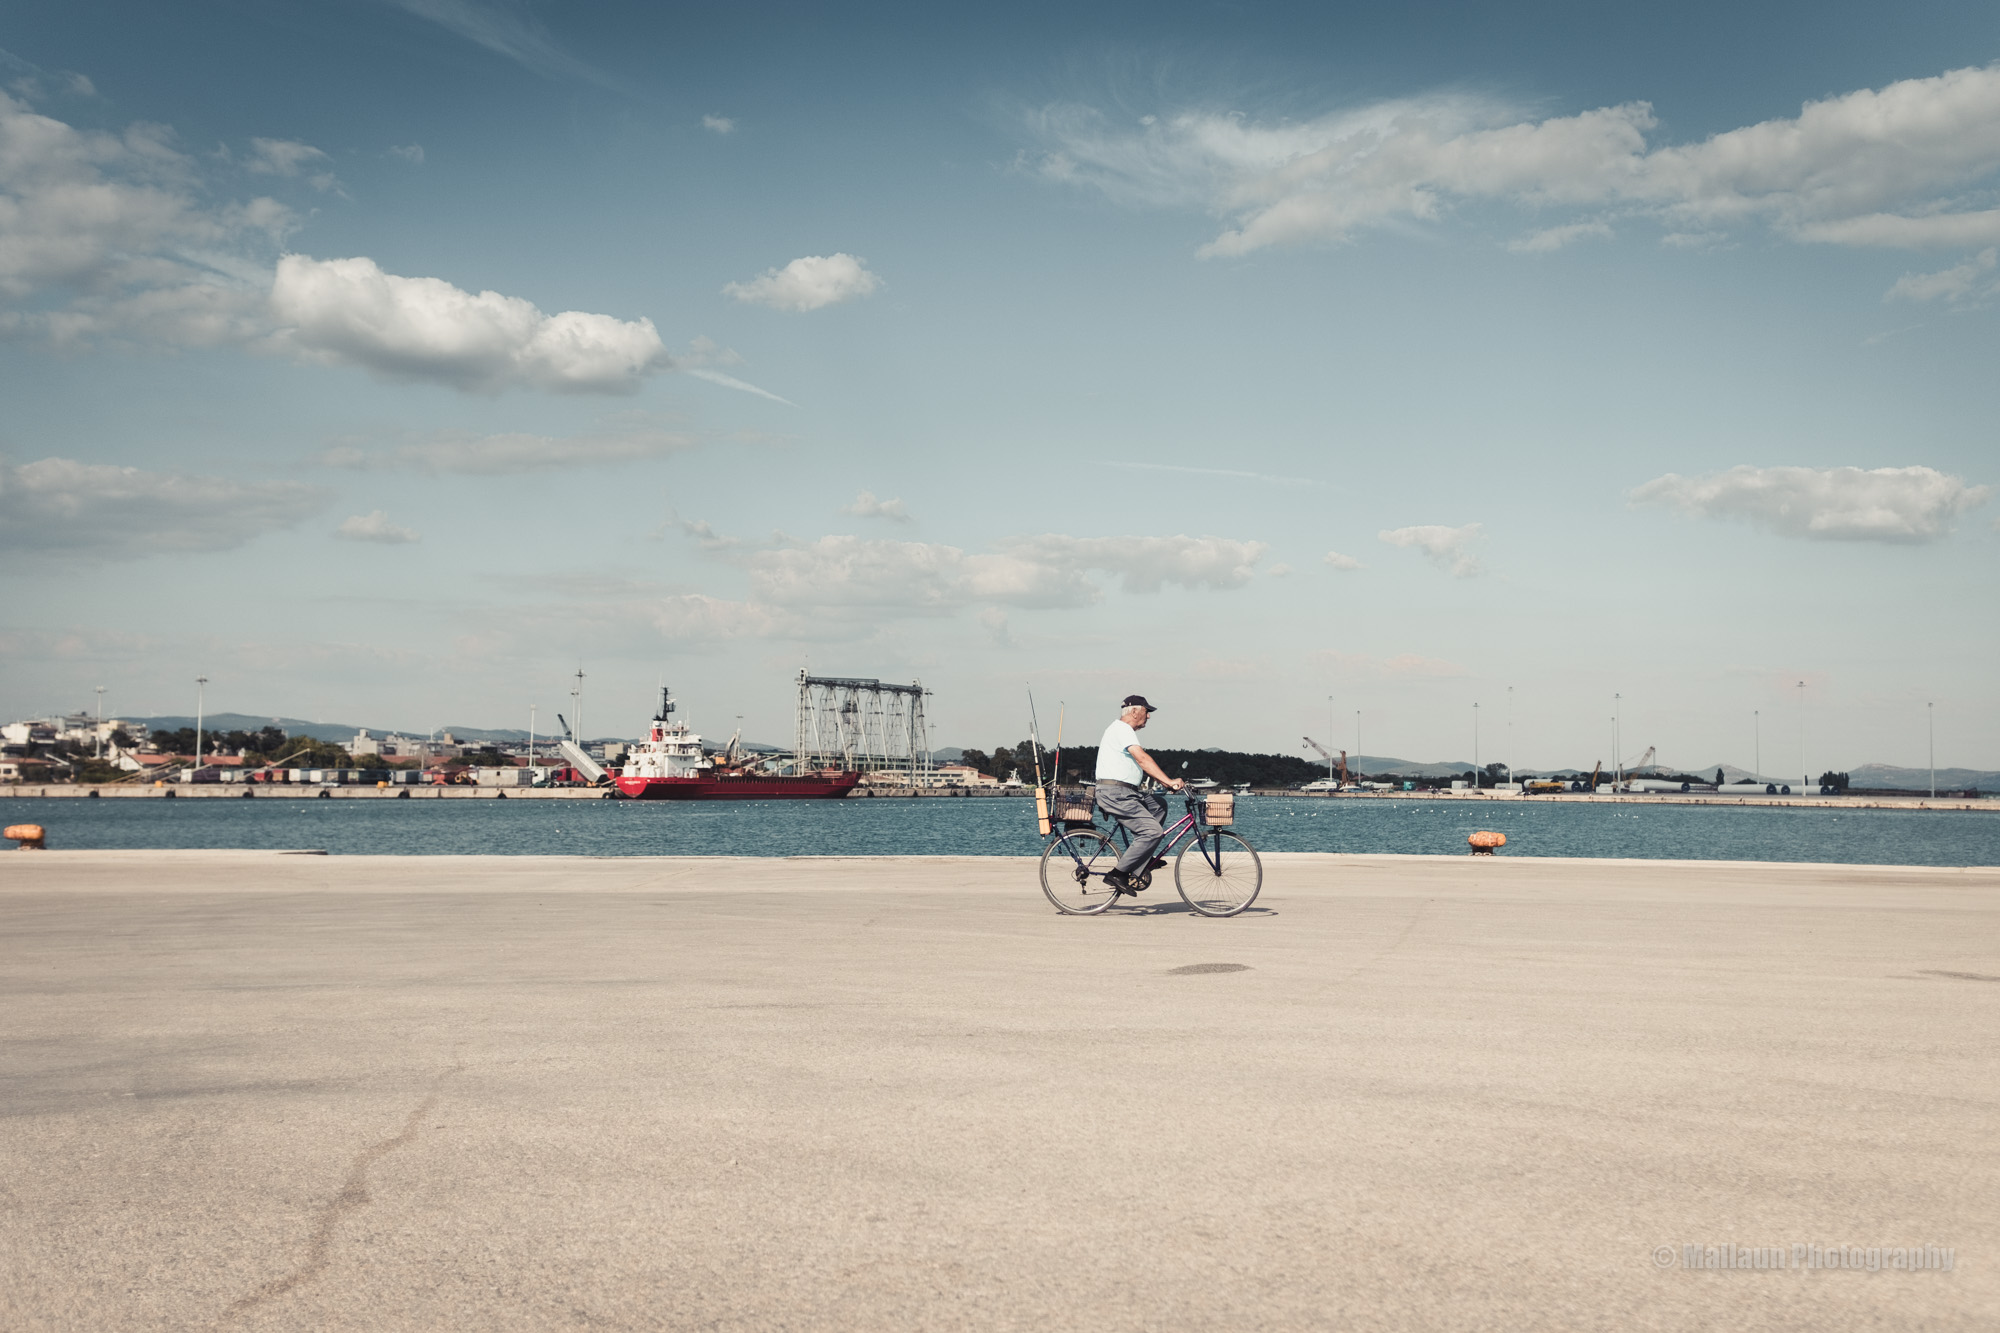 Fahrradfahrer in Griechenland © Mallaun Photography